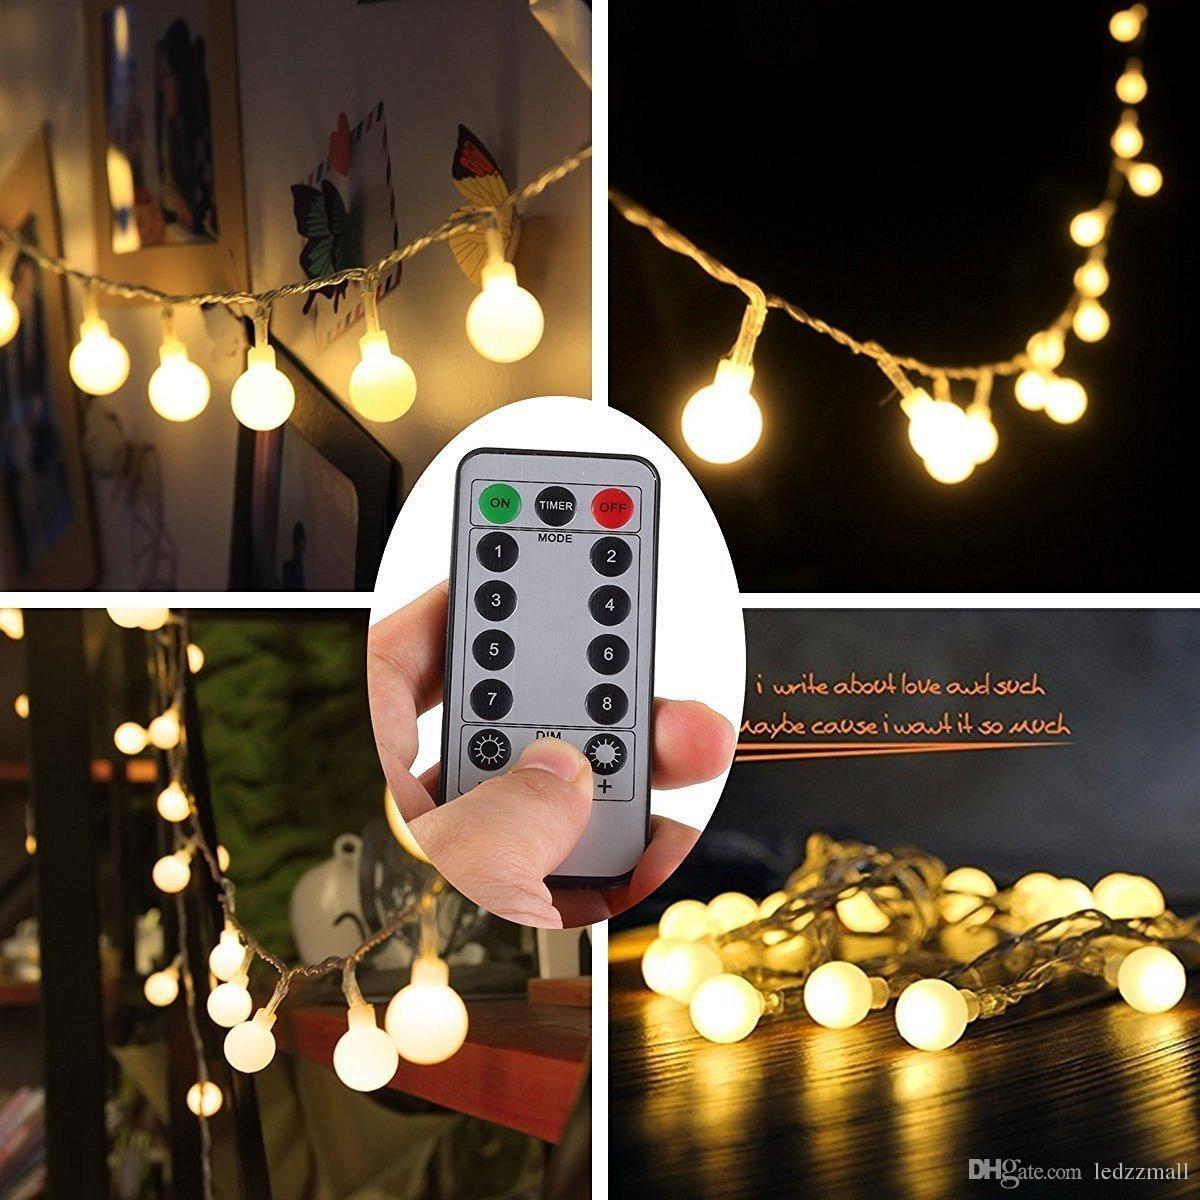 Outdoor String Light Dimmer - Outdoor Lighting Ideas